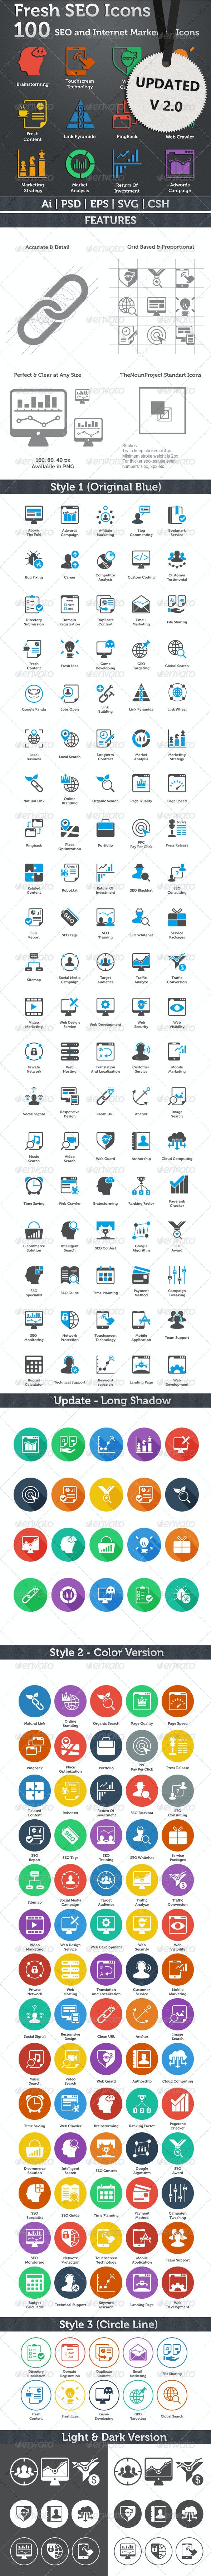 Fresh SEO Icons - SEO and Internet Marketing Icons - Icons